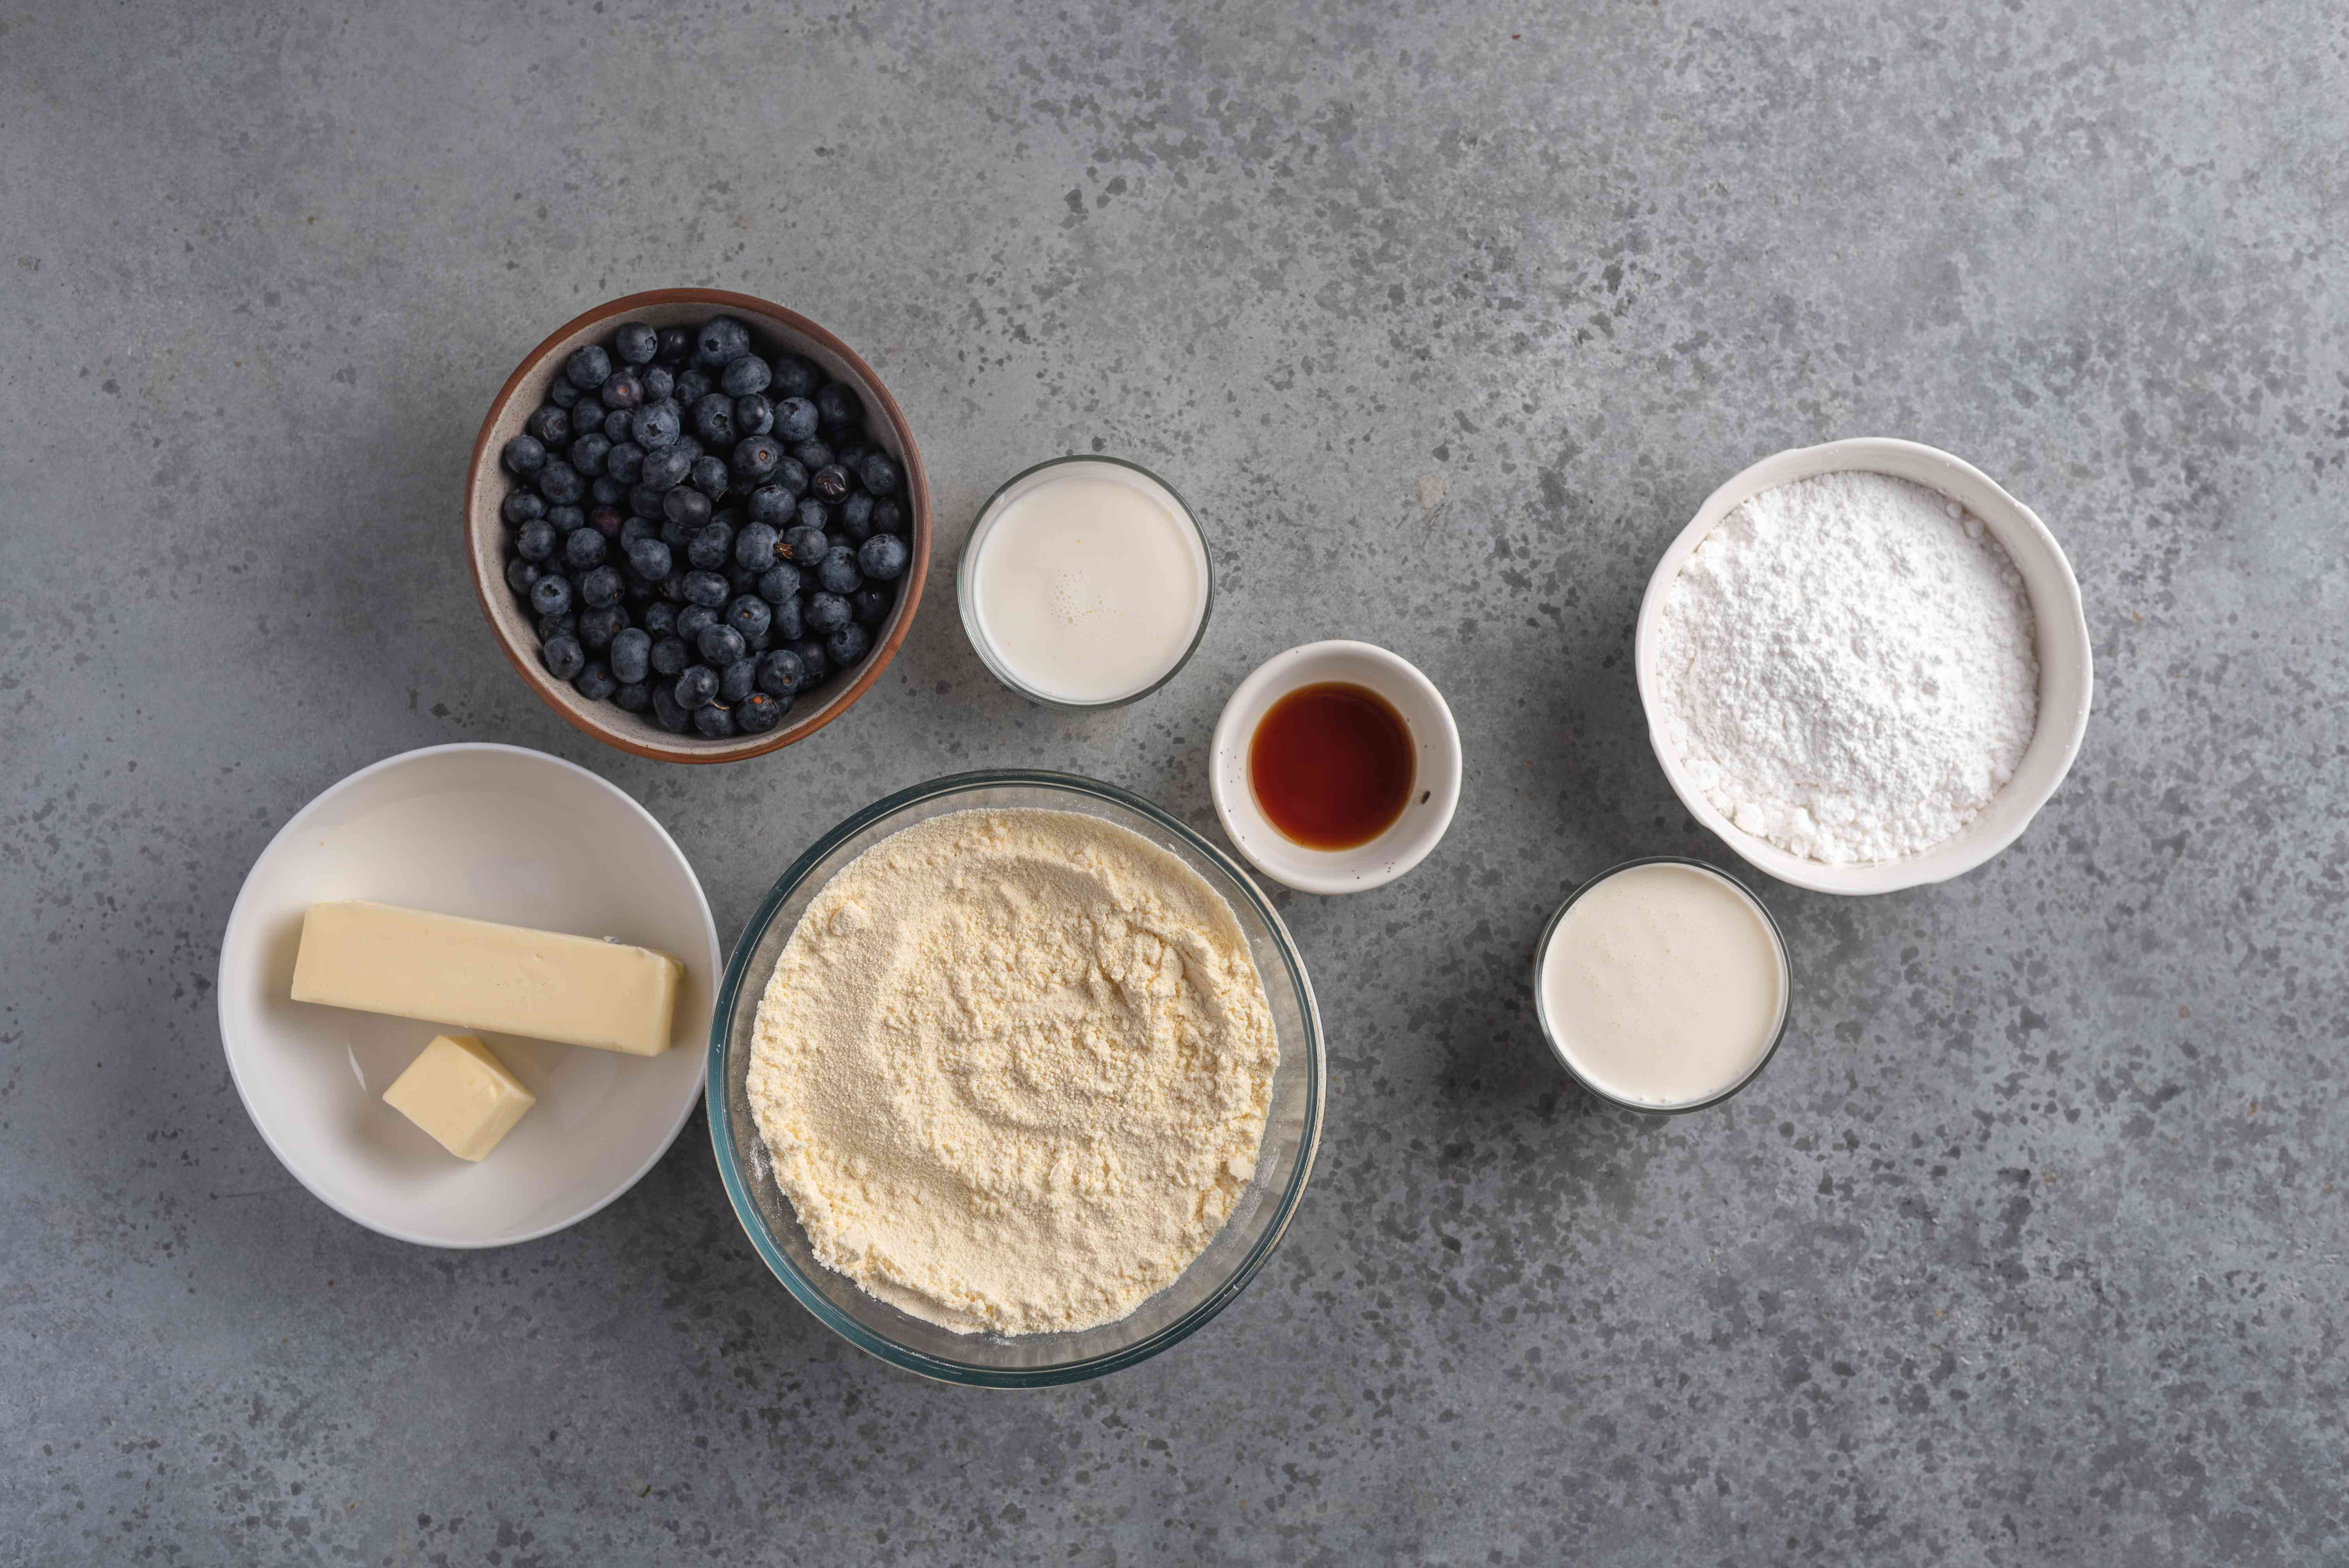 Blueberry Dump Cake ingredients